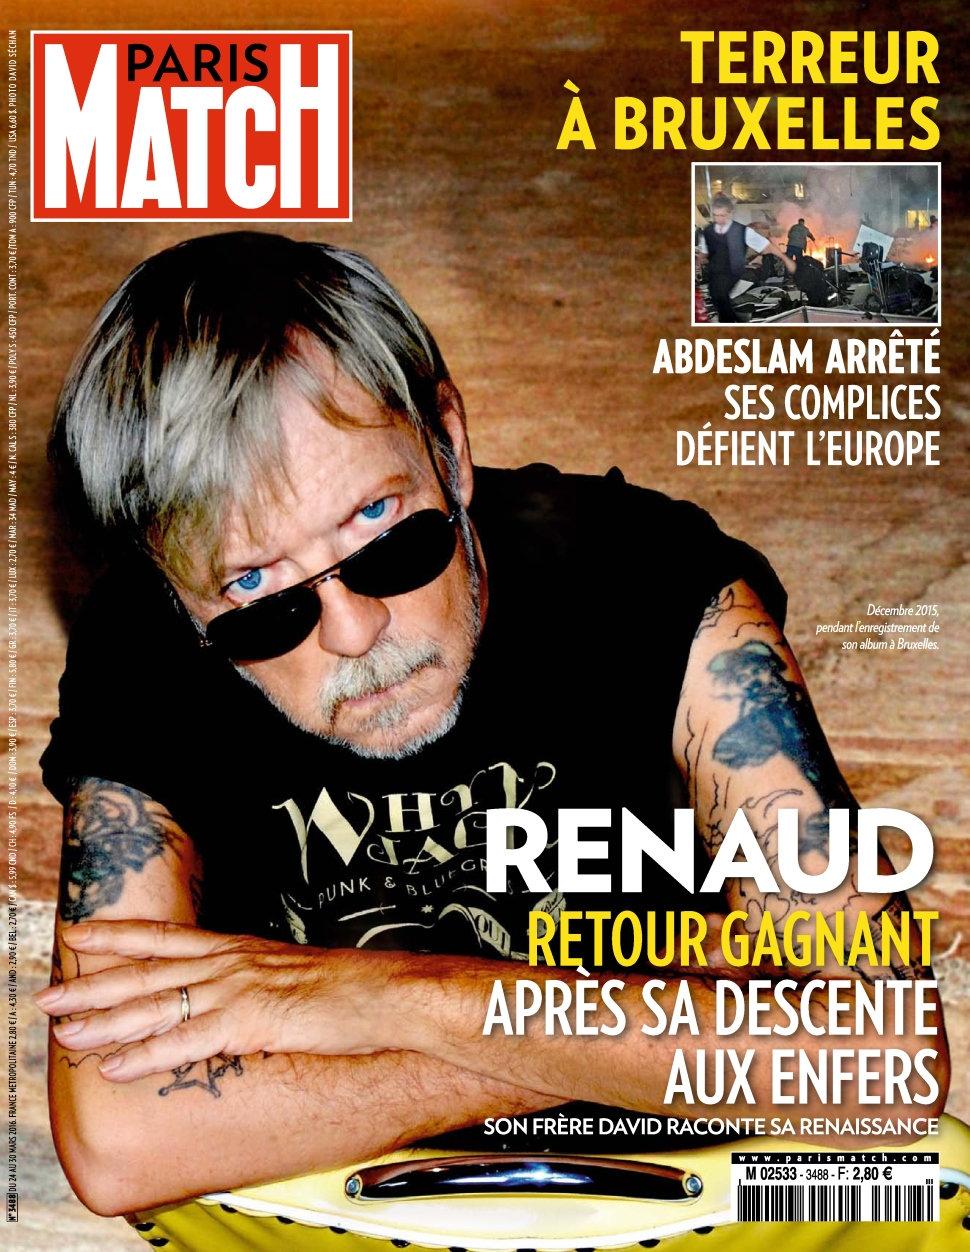 Paris Match N°3488 - 24 au 30 Mars 2016